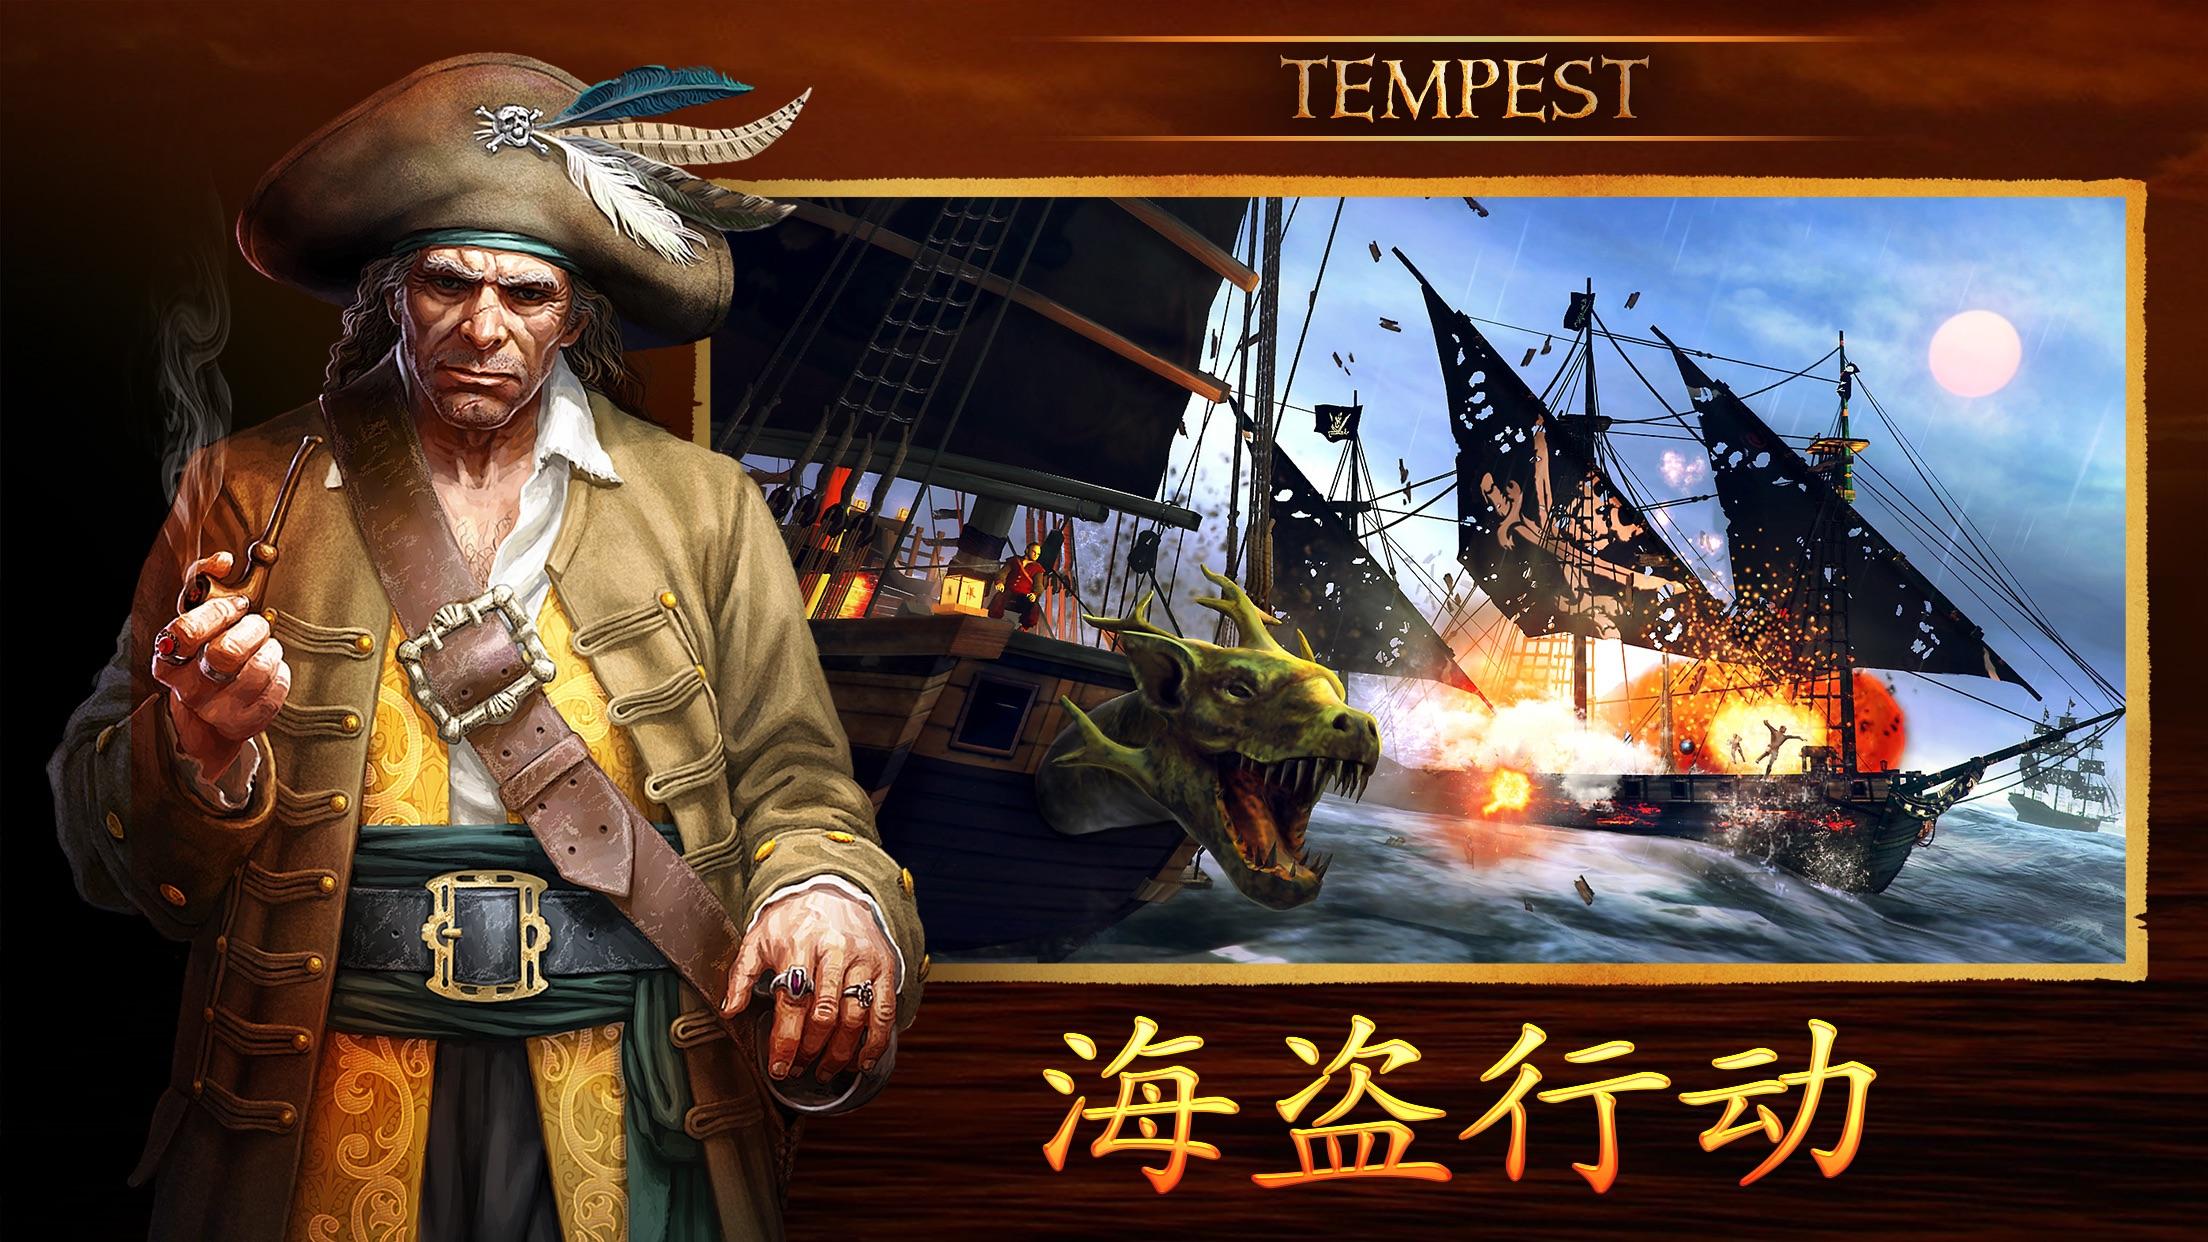 Tempest: 海盗行动角色扮演游戏 Screenshot